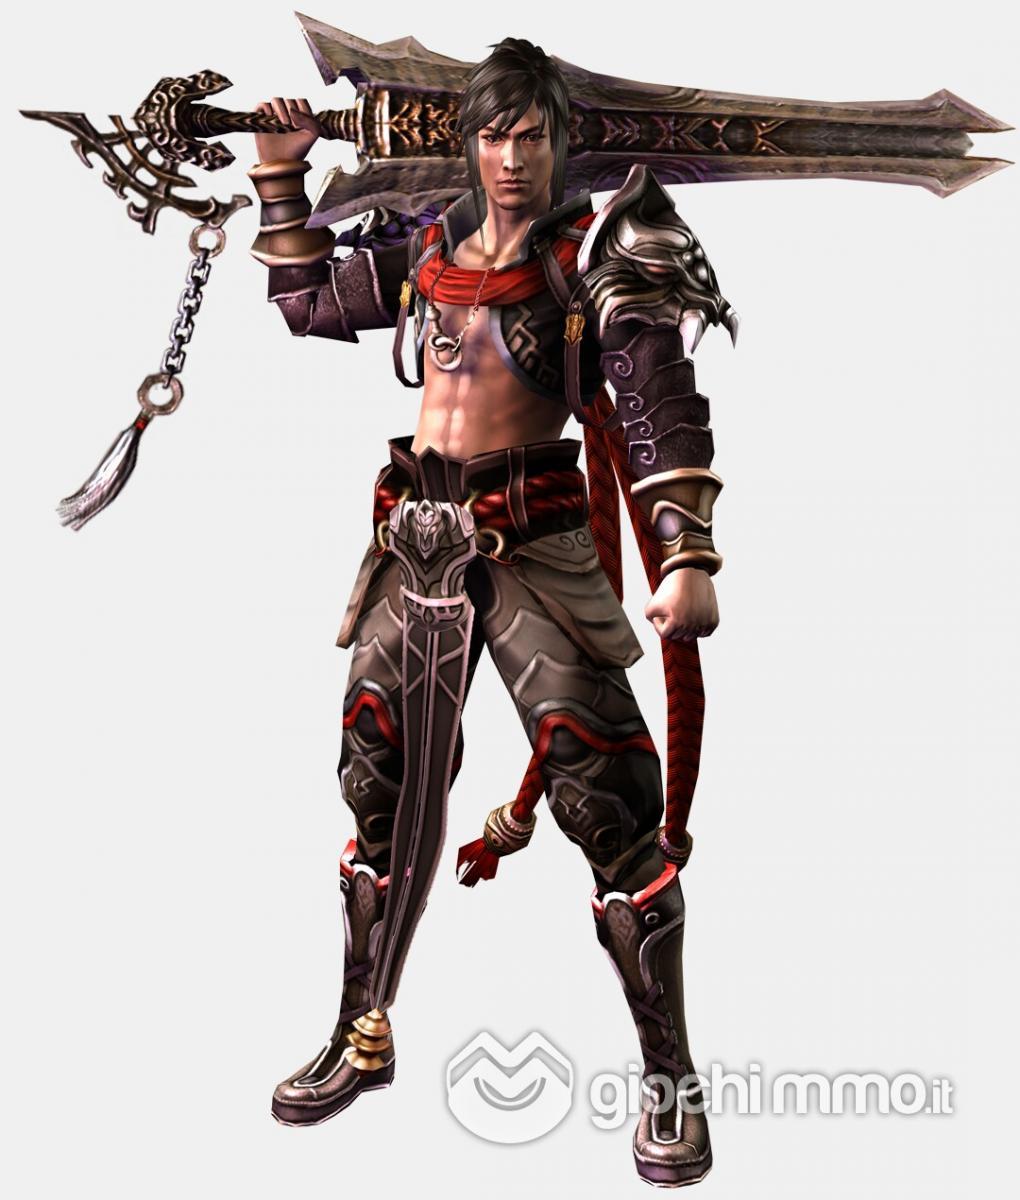 Clicca sull'immagine per ingrandirlaNome:   Scarlet Legacy Assassin screen2.jpgVisite: 65Dimensione:   108.2 KBID: 8326